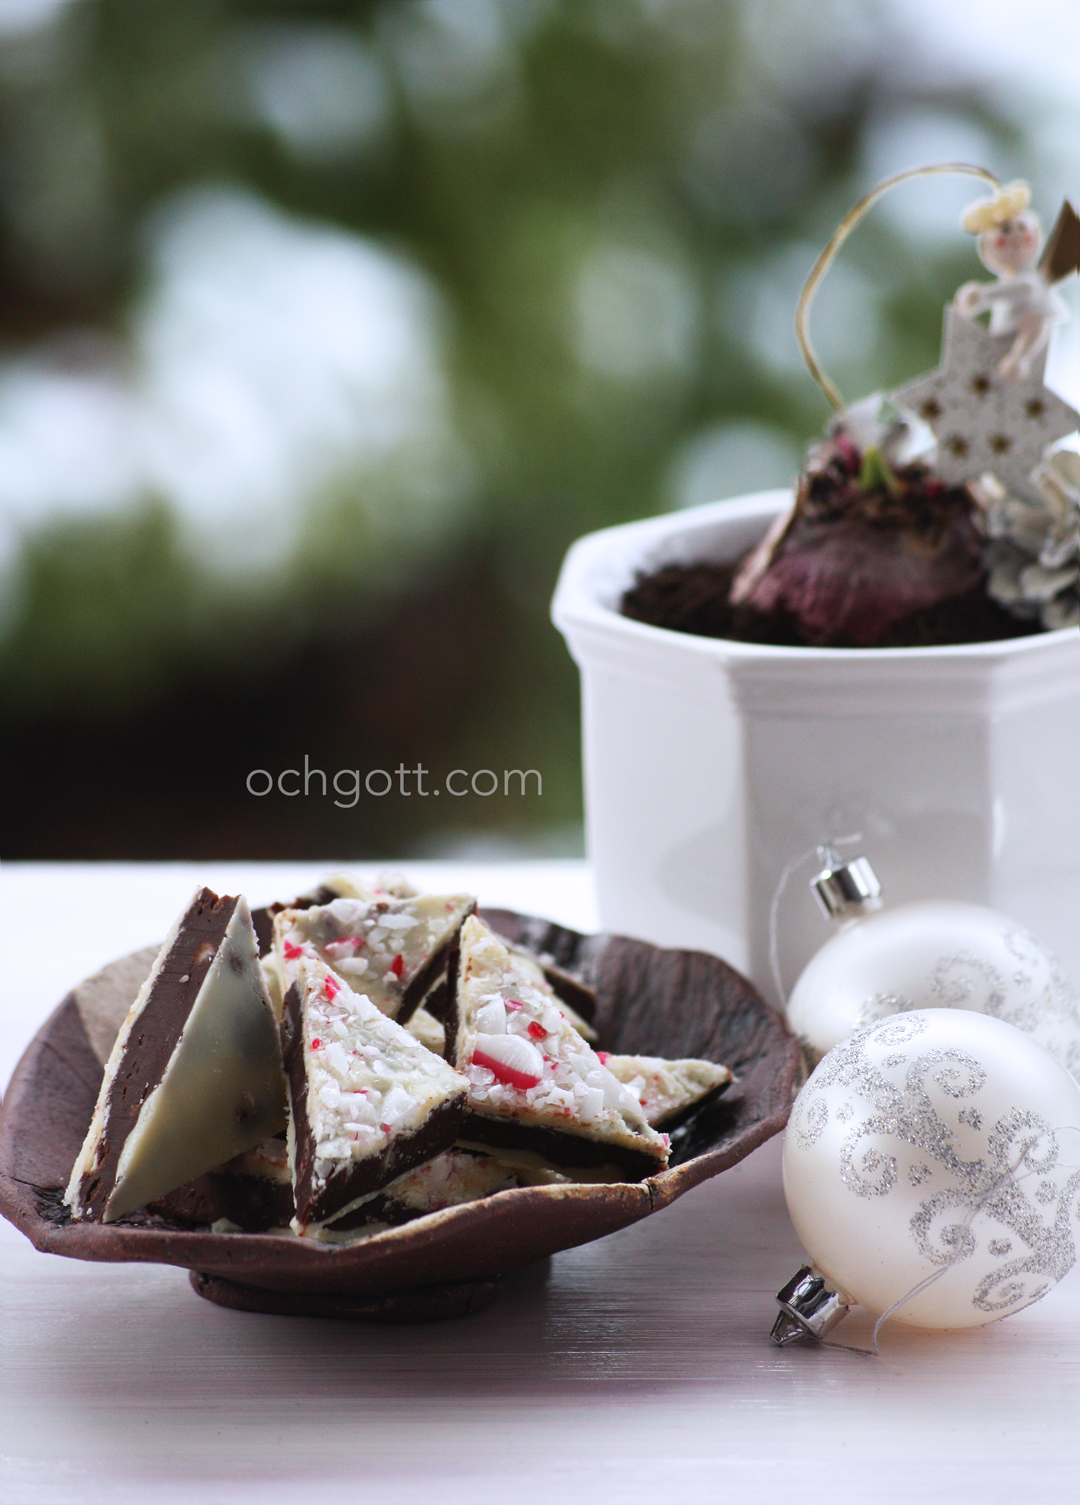 Fudgekonfekt med polkagrisar - Foto: Britt-Marie Knutsson